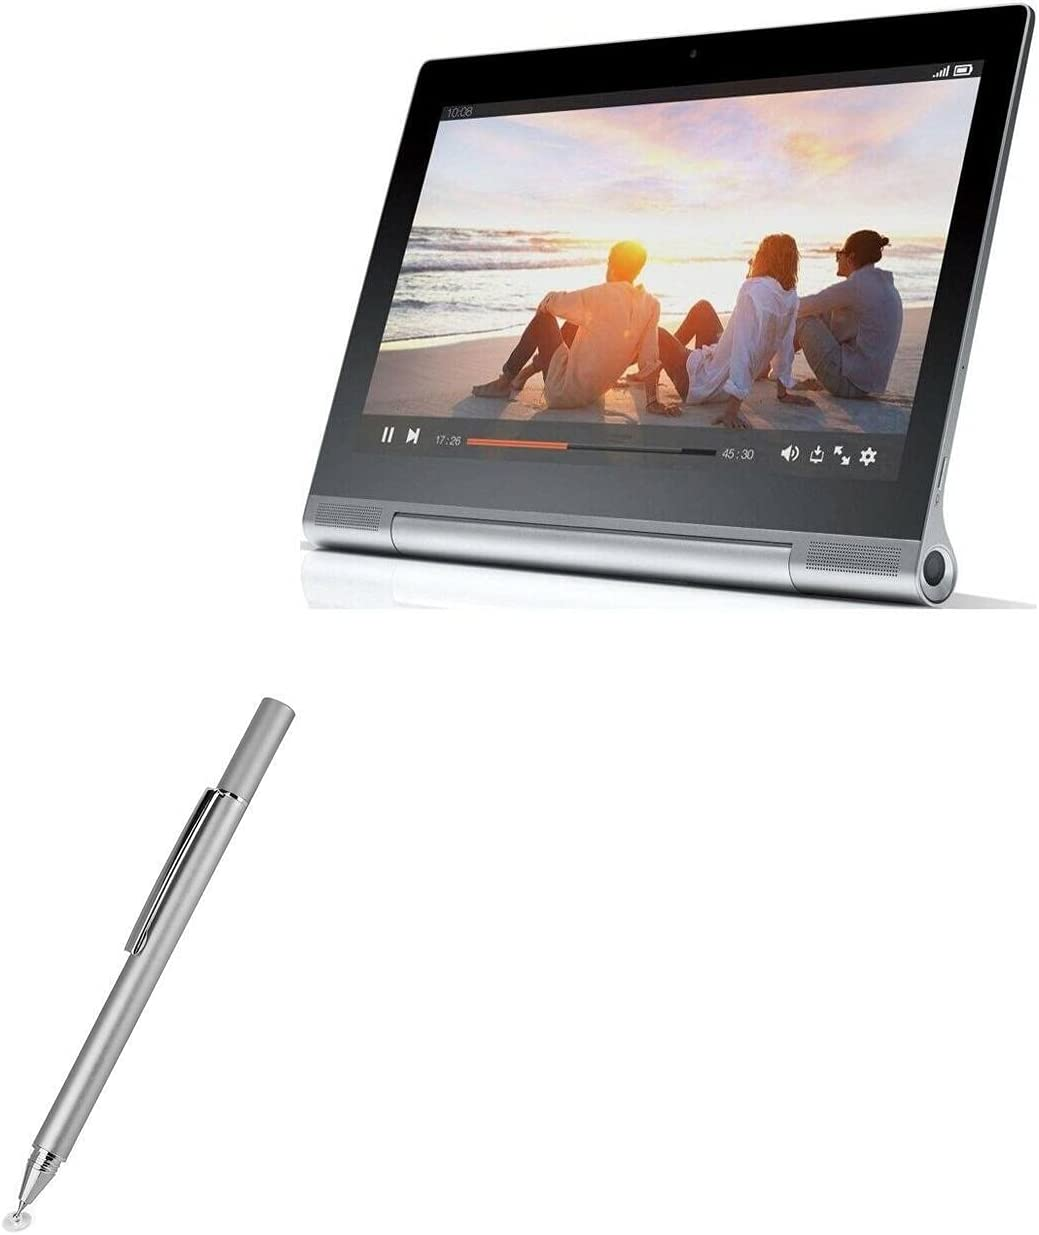 Stylus Pen for Lenovo Yoga Tablet 2 Pro (Stylus Pen by BoxWave) - FineTouch Capacitive Stylus, Super Precise Stylus Pen for Lenovo Yoga Tablet 2 Pro - Metallic Silver